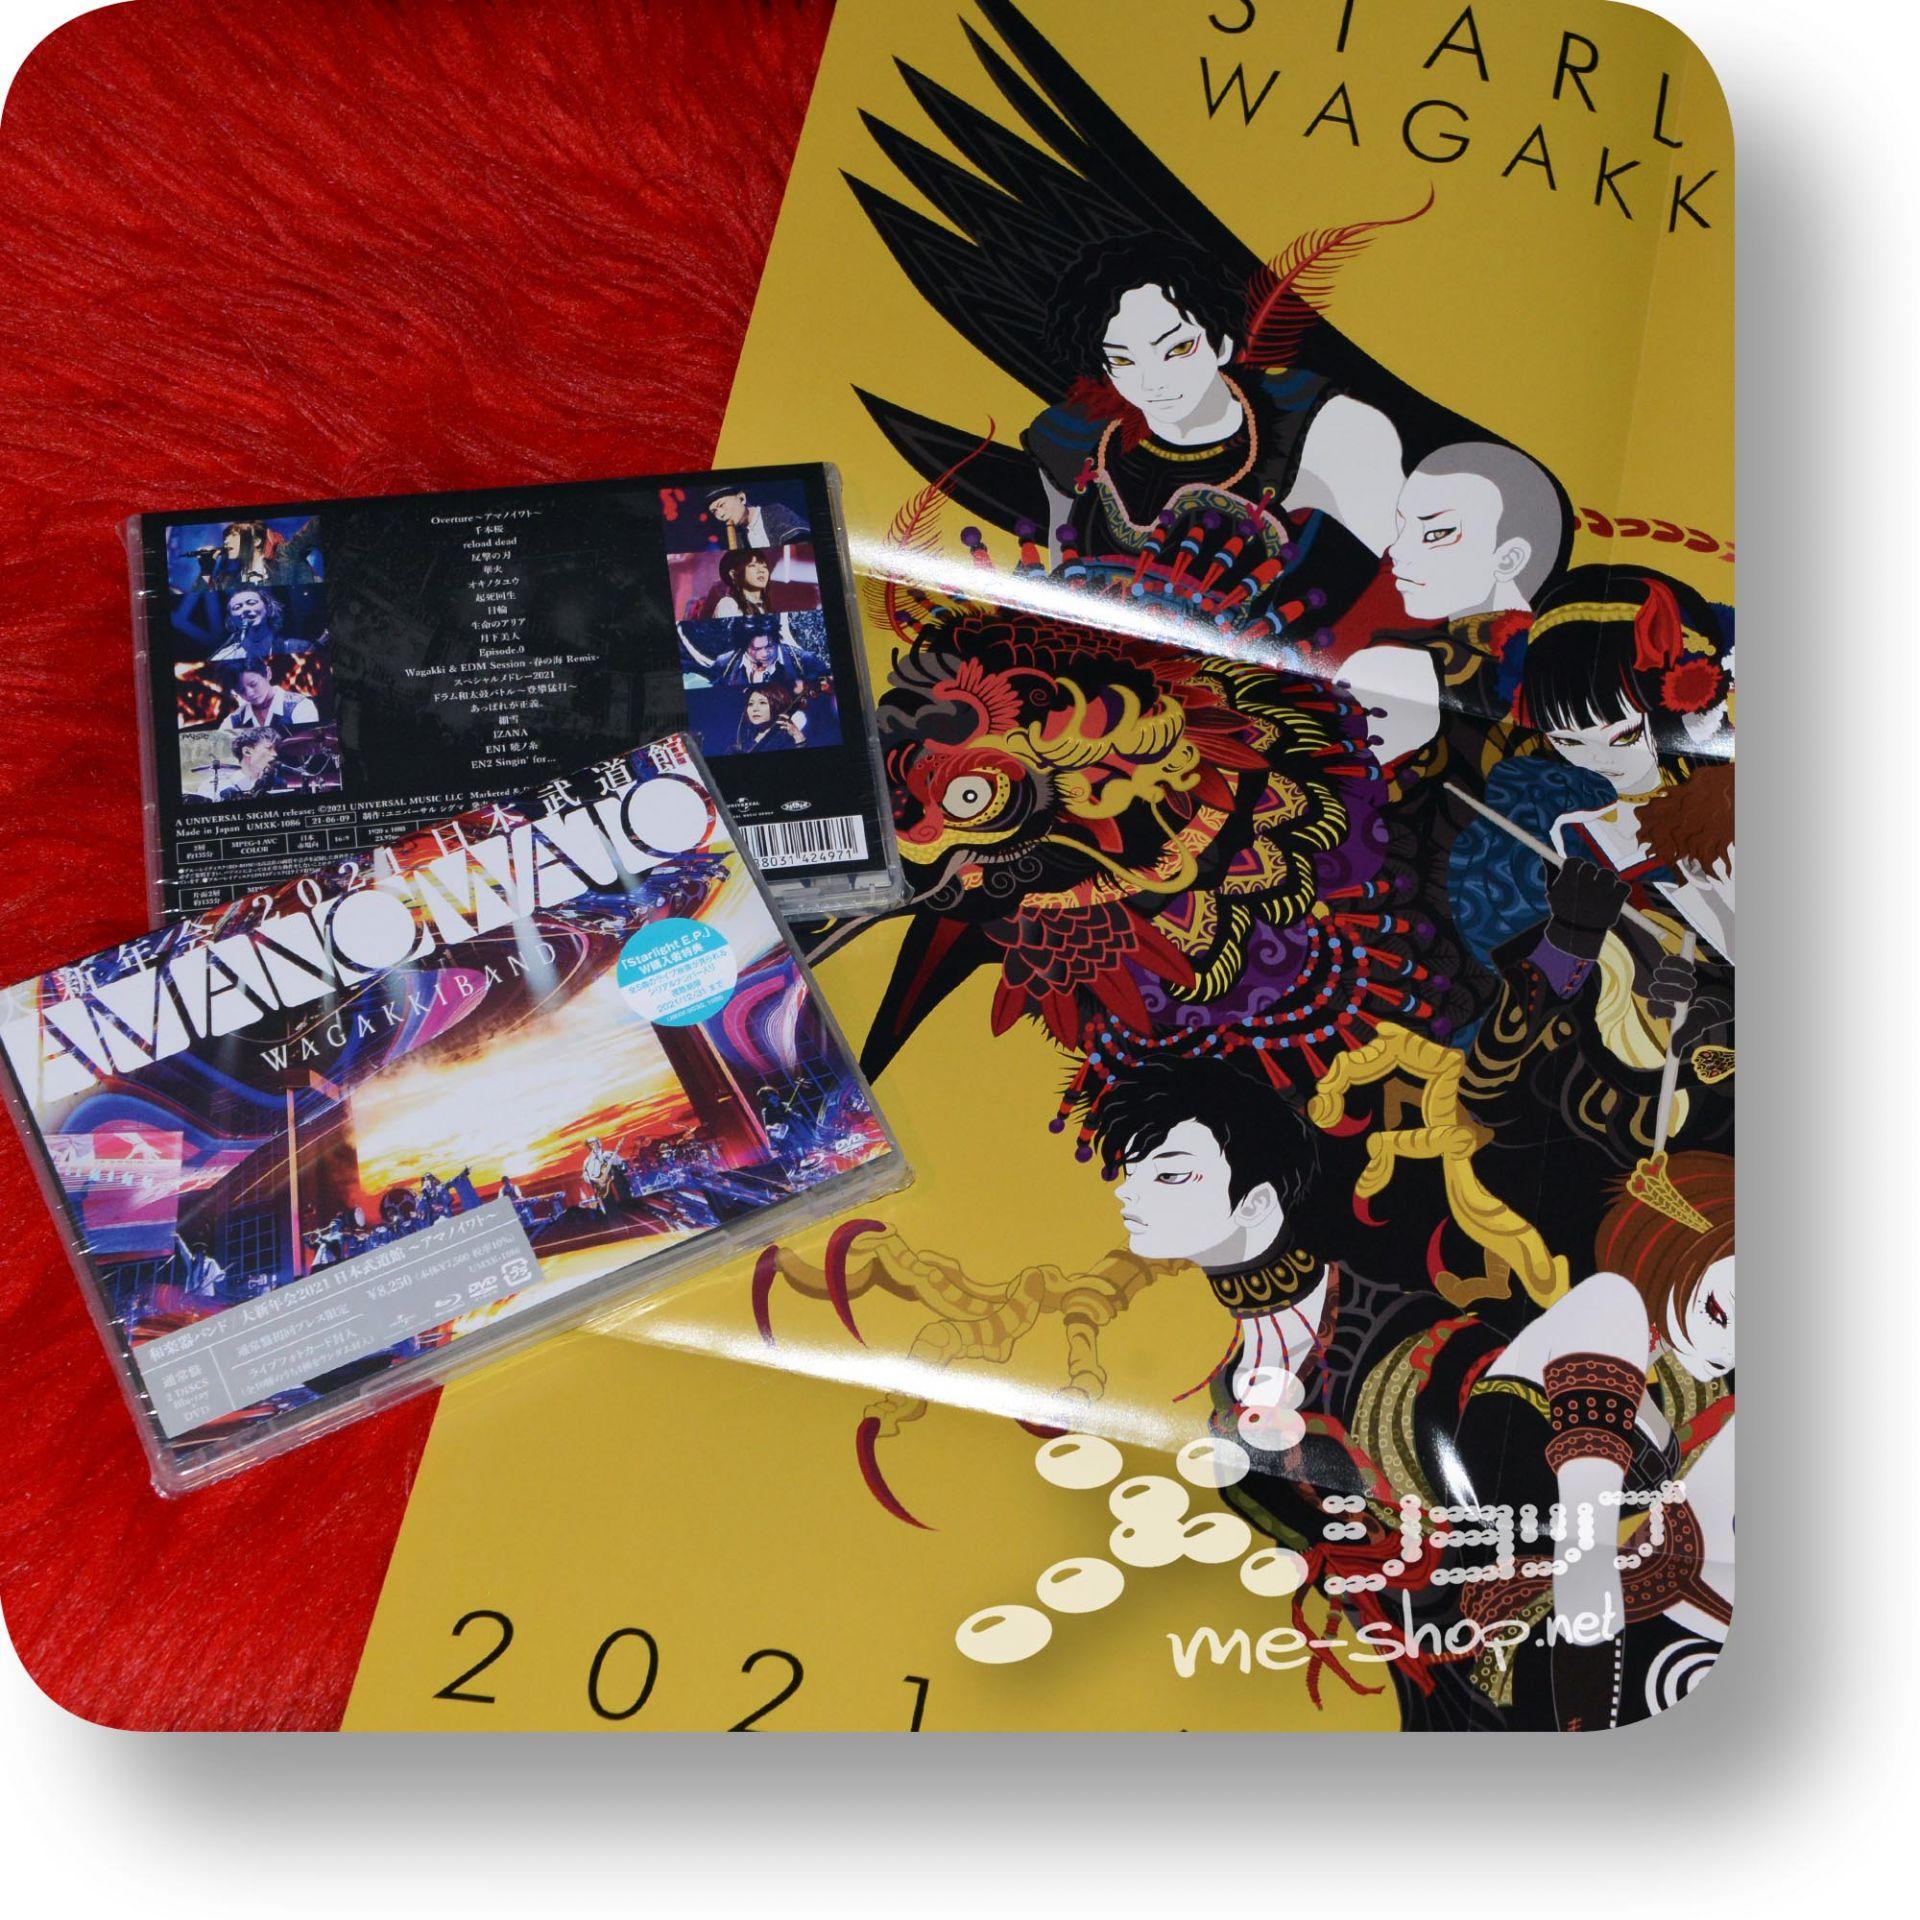 wagakki band amanoiwato bd+bonus